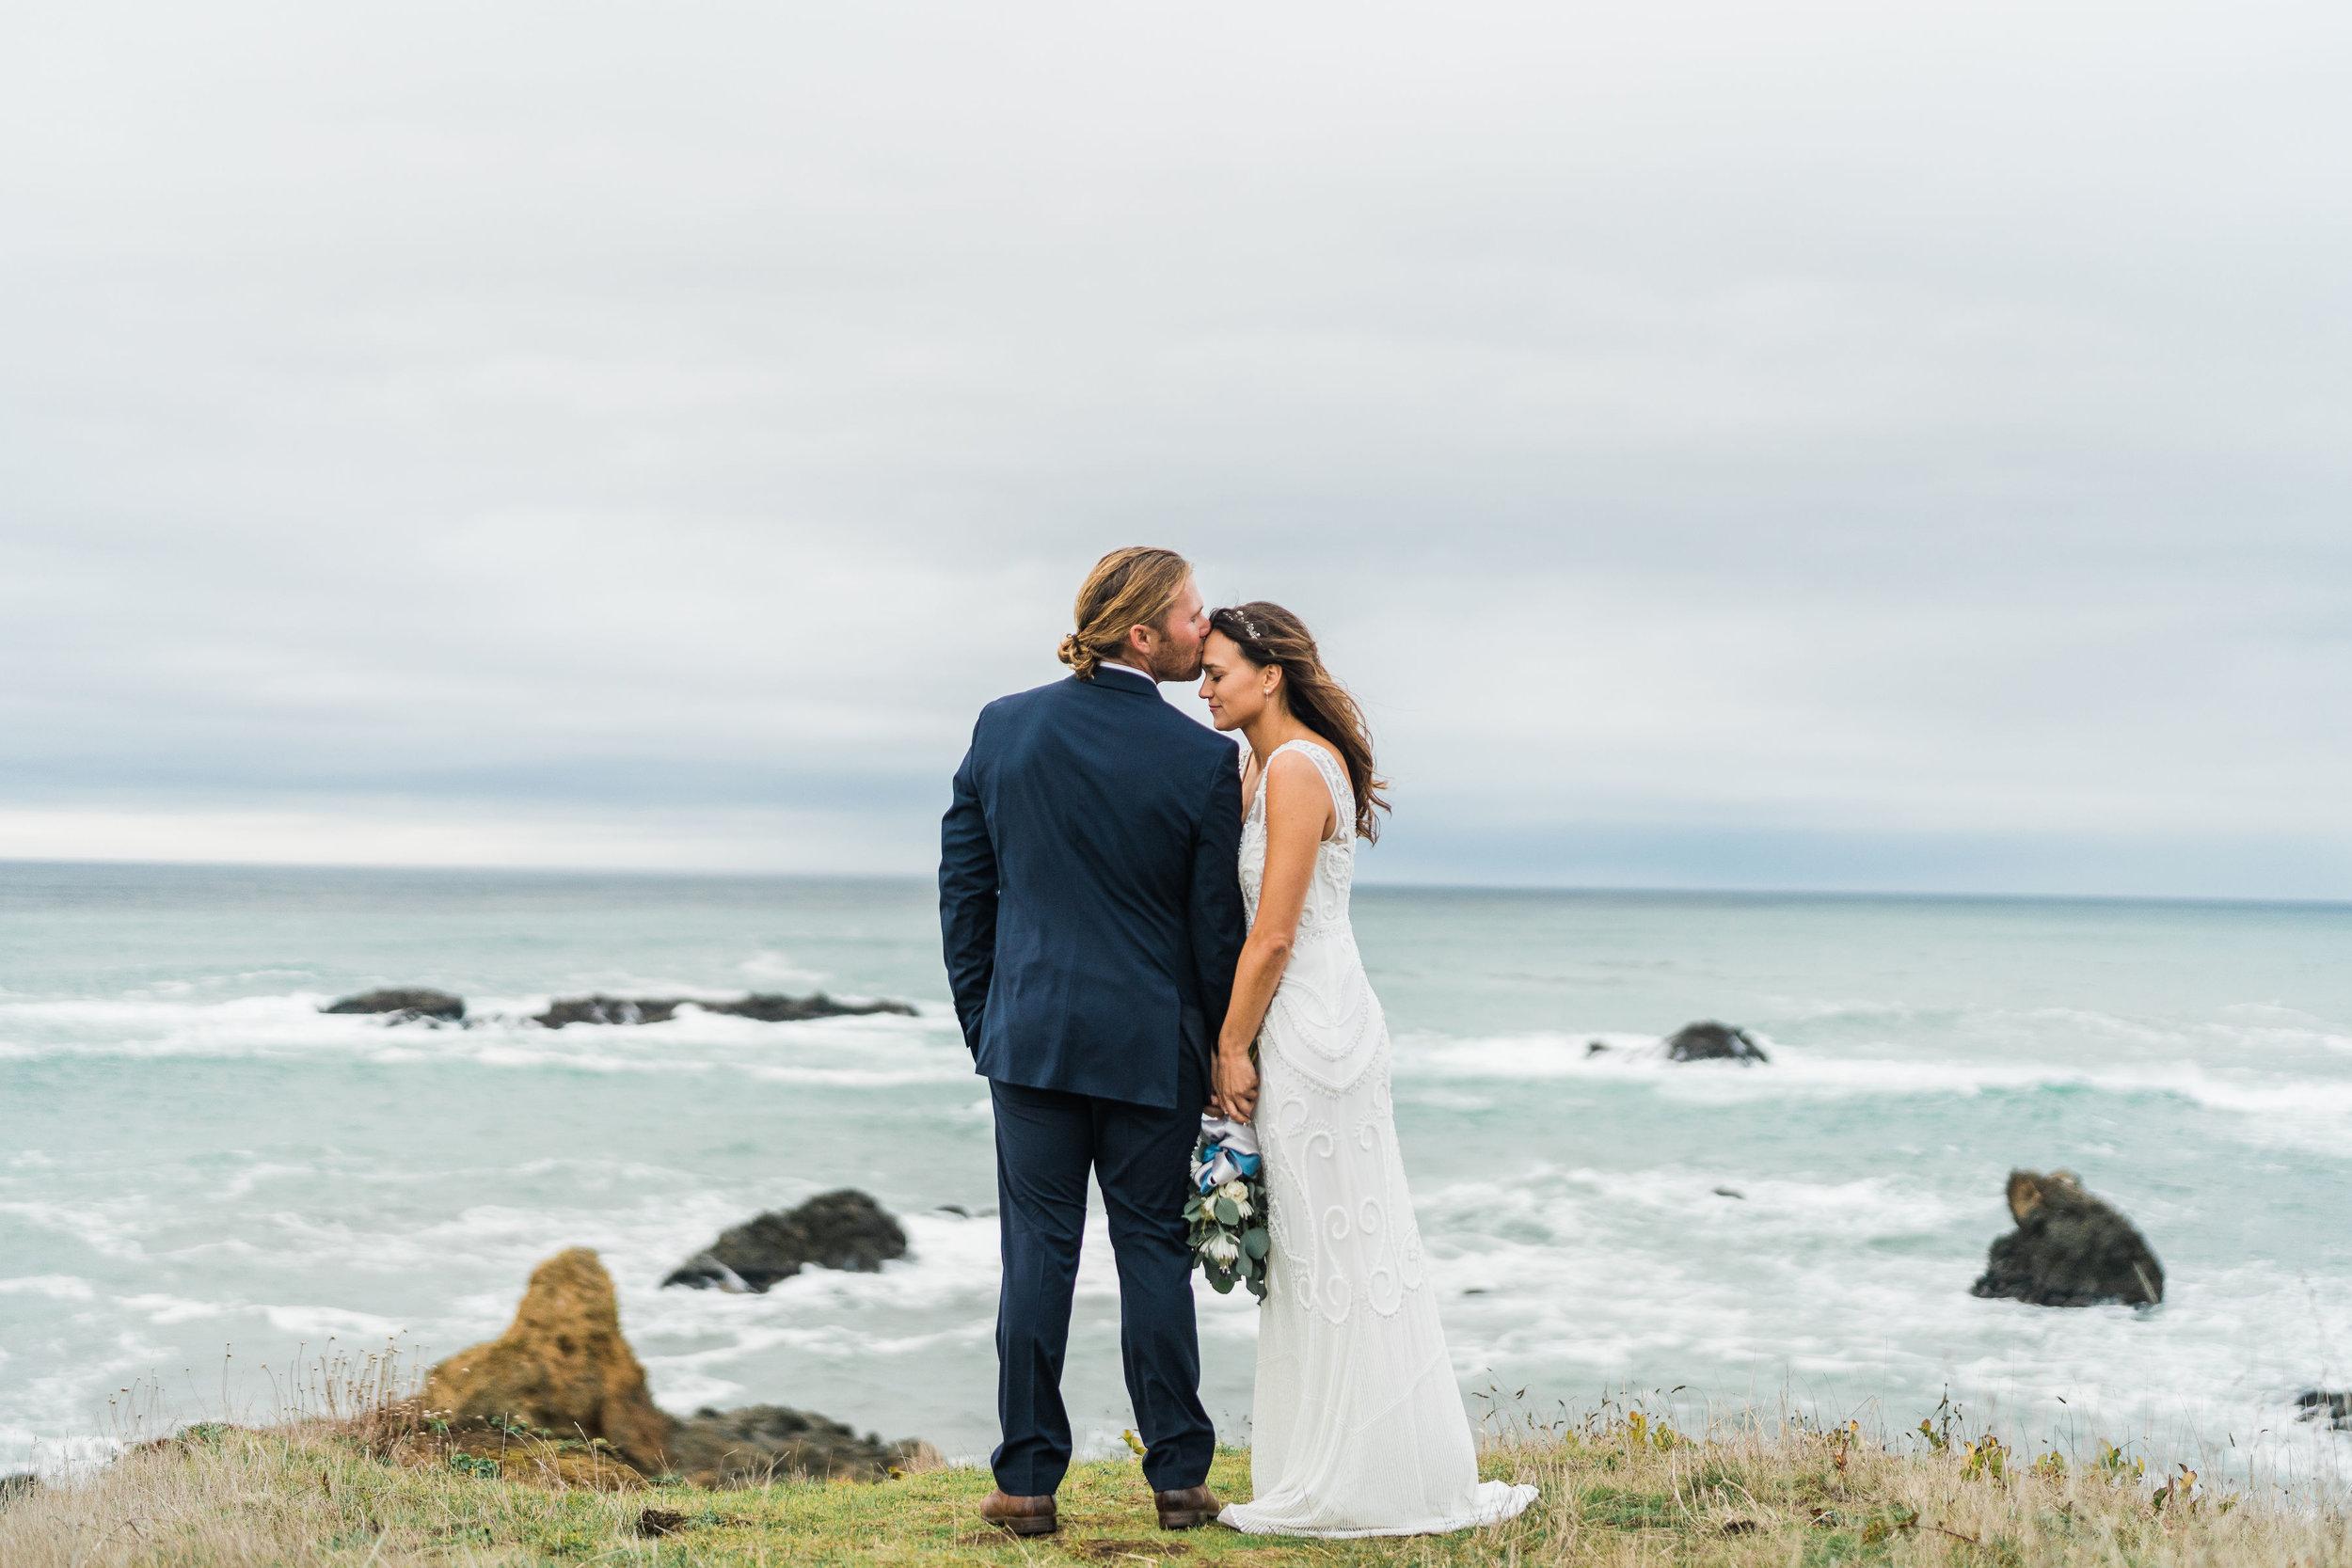 switzer-farm-wedding-westport-brandon-bibbins-photograhy-fine-art-047.jpg